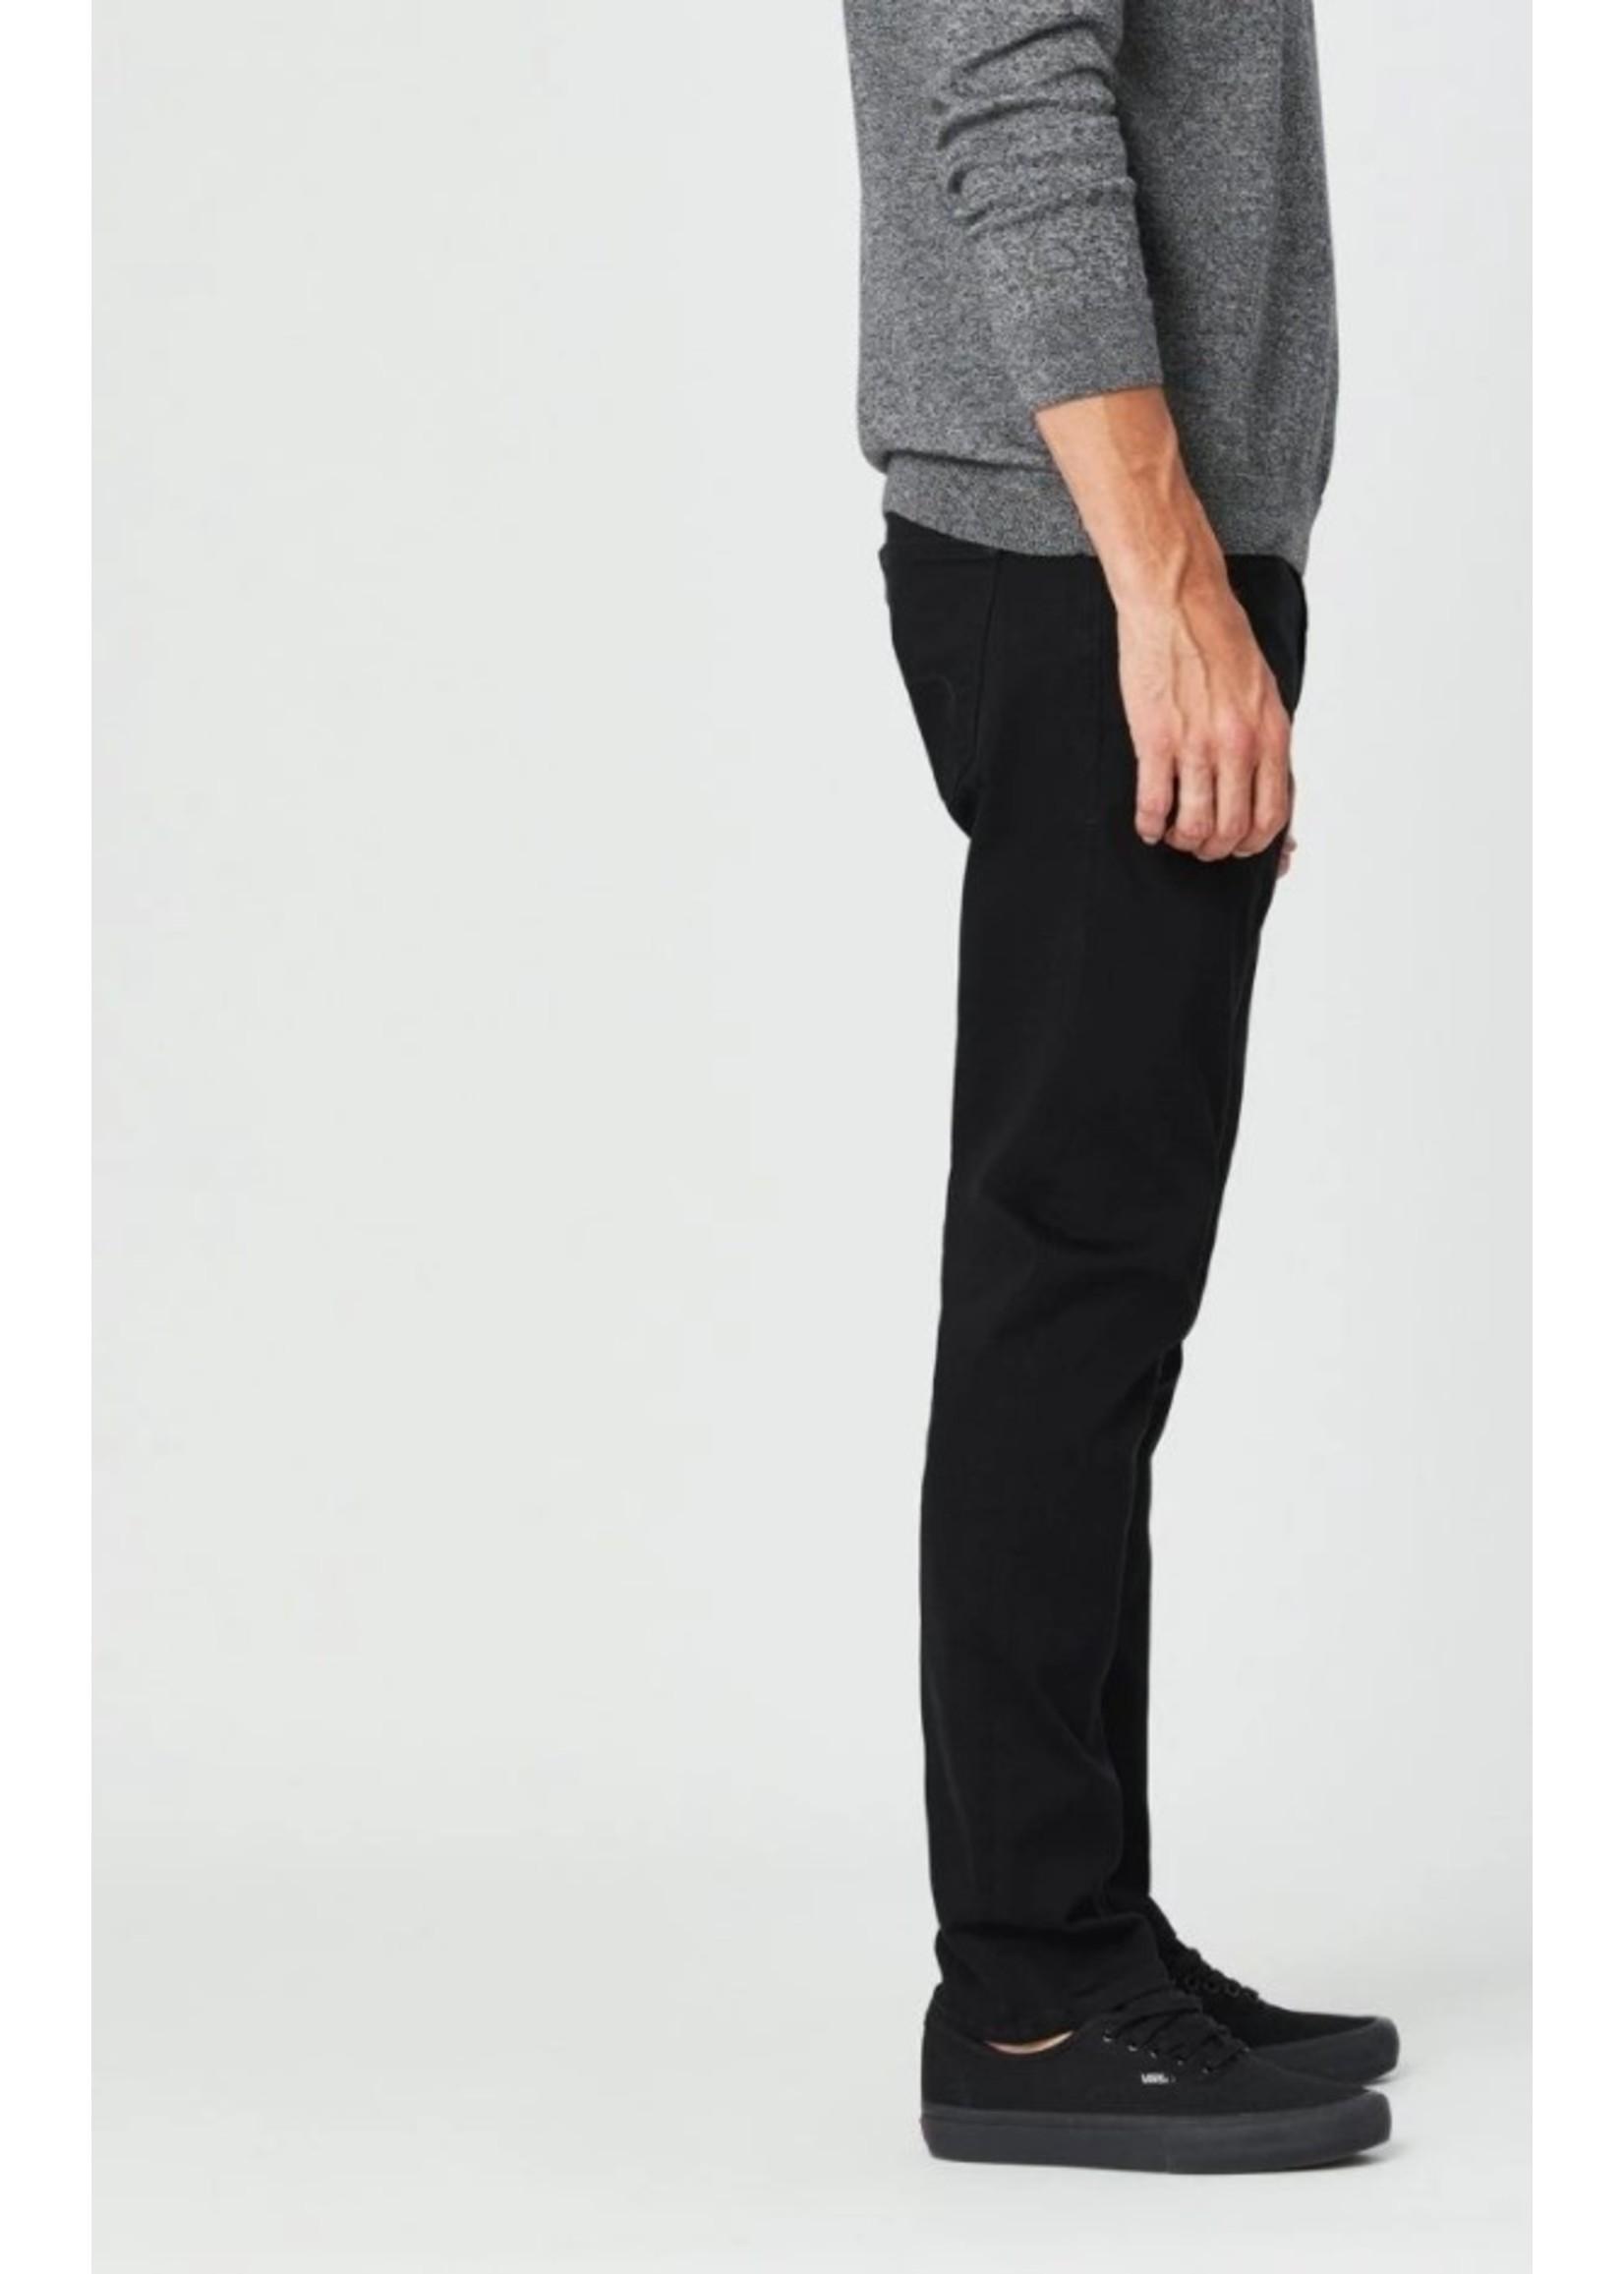 Mavi Jeans Jake Double Black Supermove